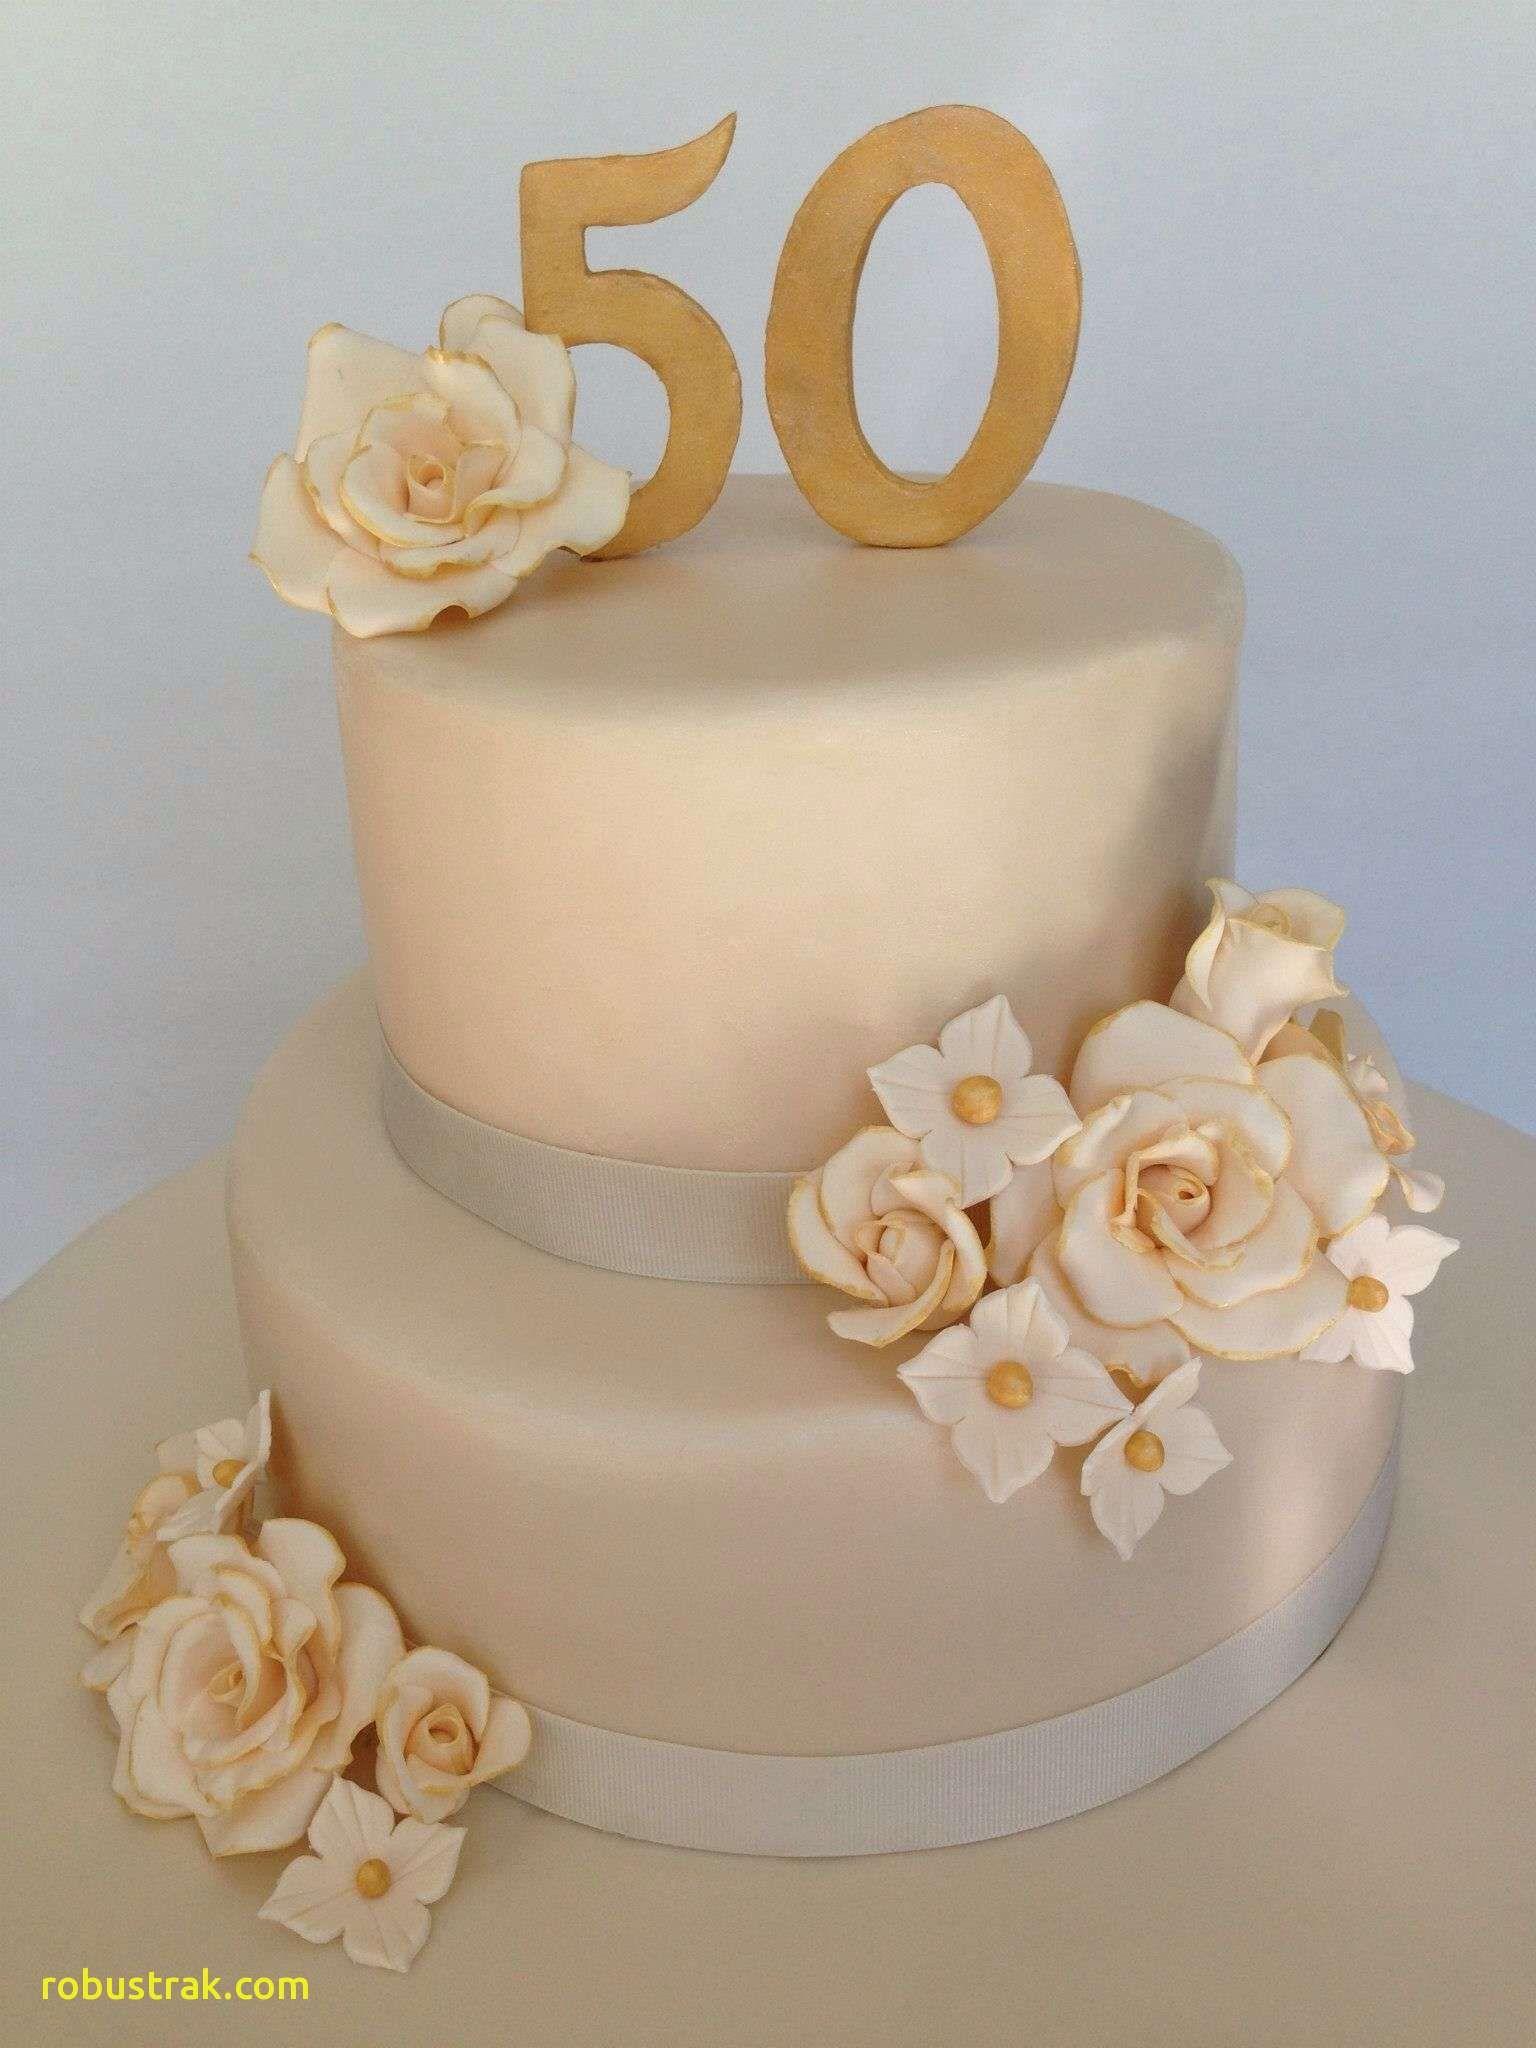 50th Wedding Anniversary Cake Ideas Elegant 21 Unique 50th Wedding Ca In 2020 50th Wedding Anniversary Cakes 50th Anniversary Cakes 50th Wedding Anniversary Cakes Gold